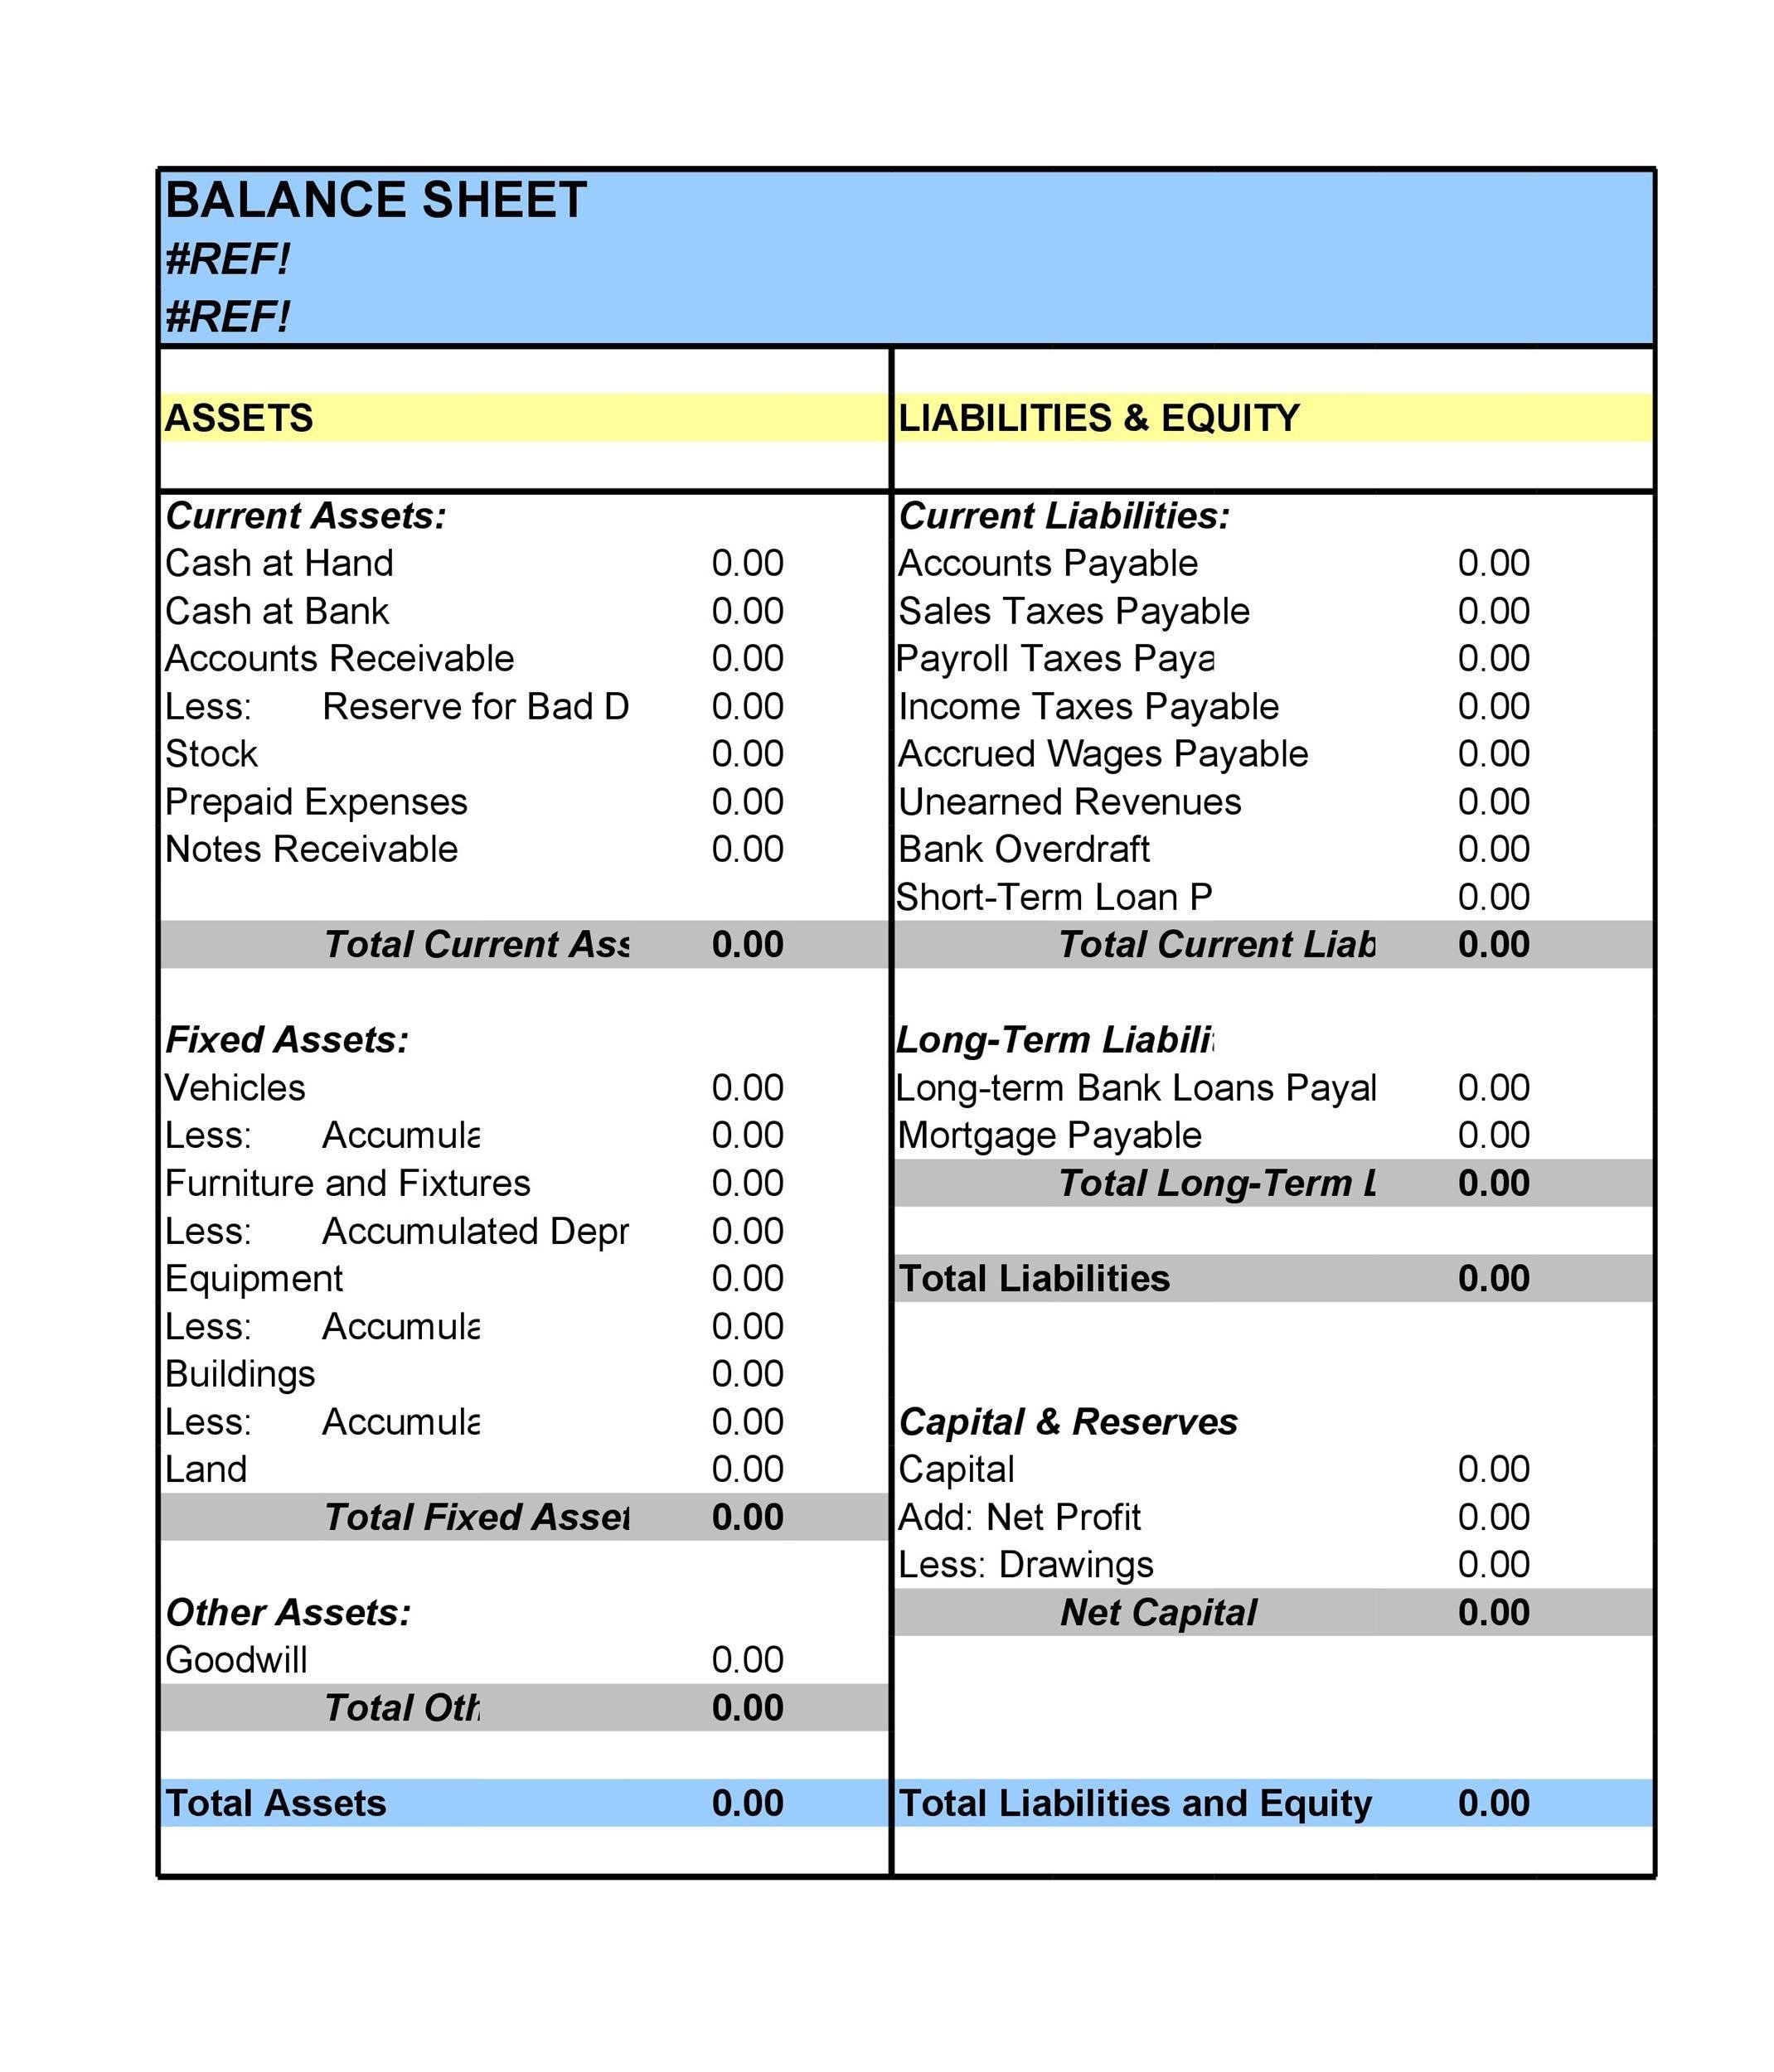 38 Free Balance Sheet Templates Amp Examples Templatelab